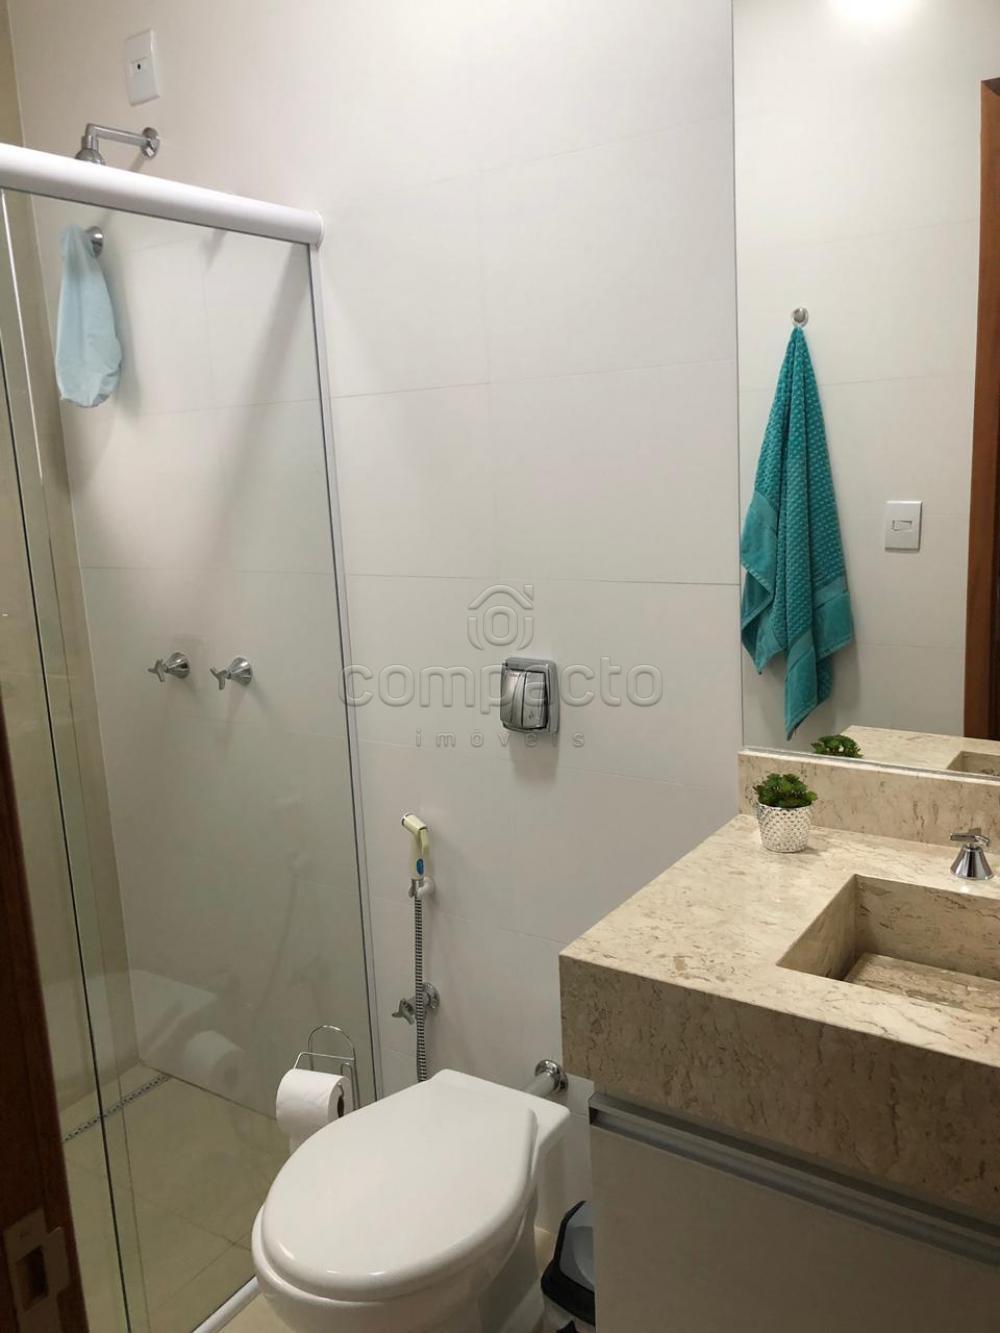 Comprar Casa / Condomínio em Bauru apenas R$ 850.000,00 - Foto 7